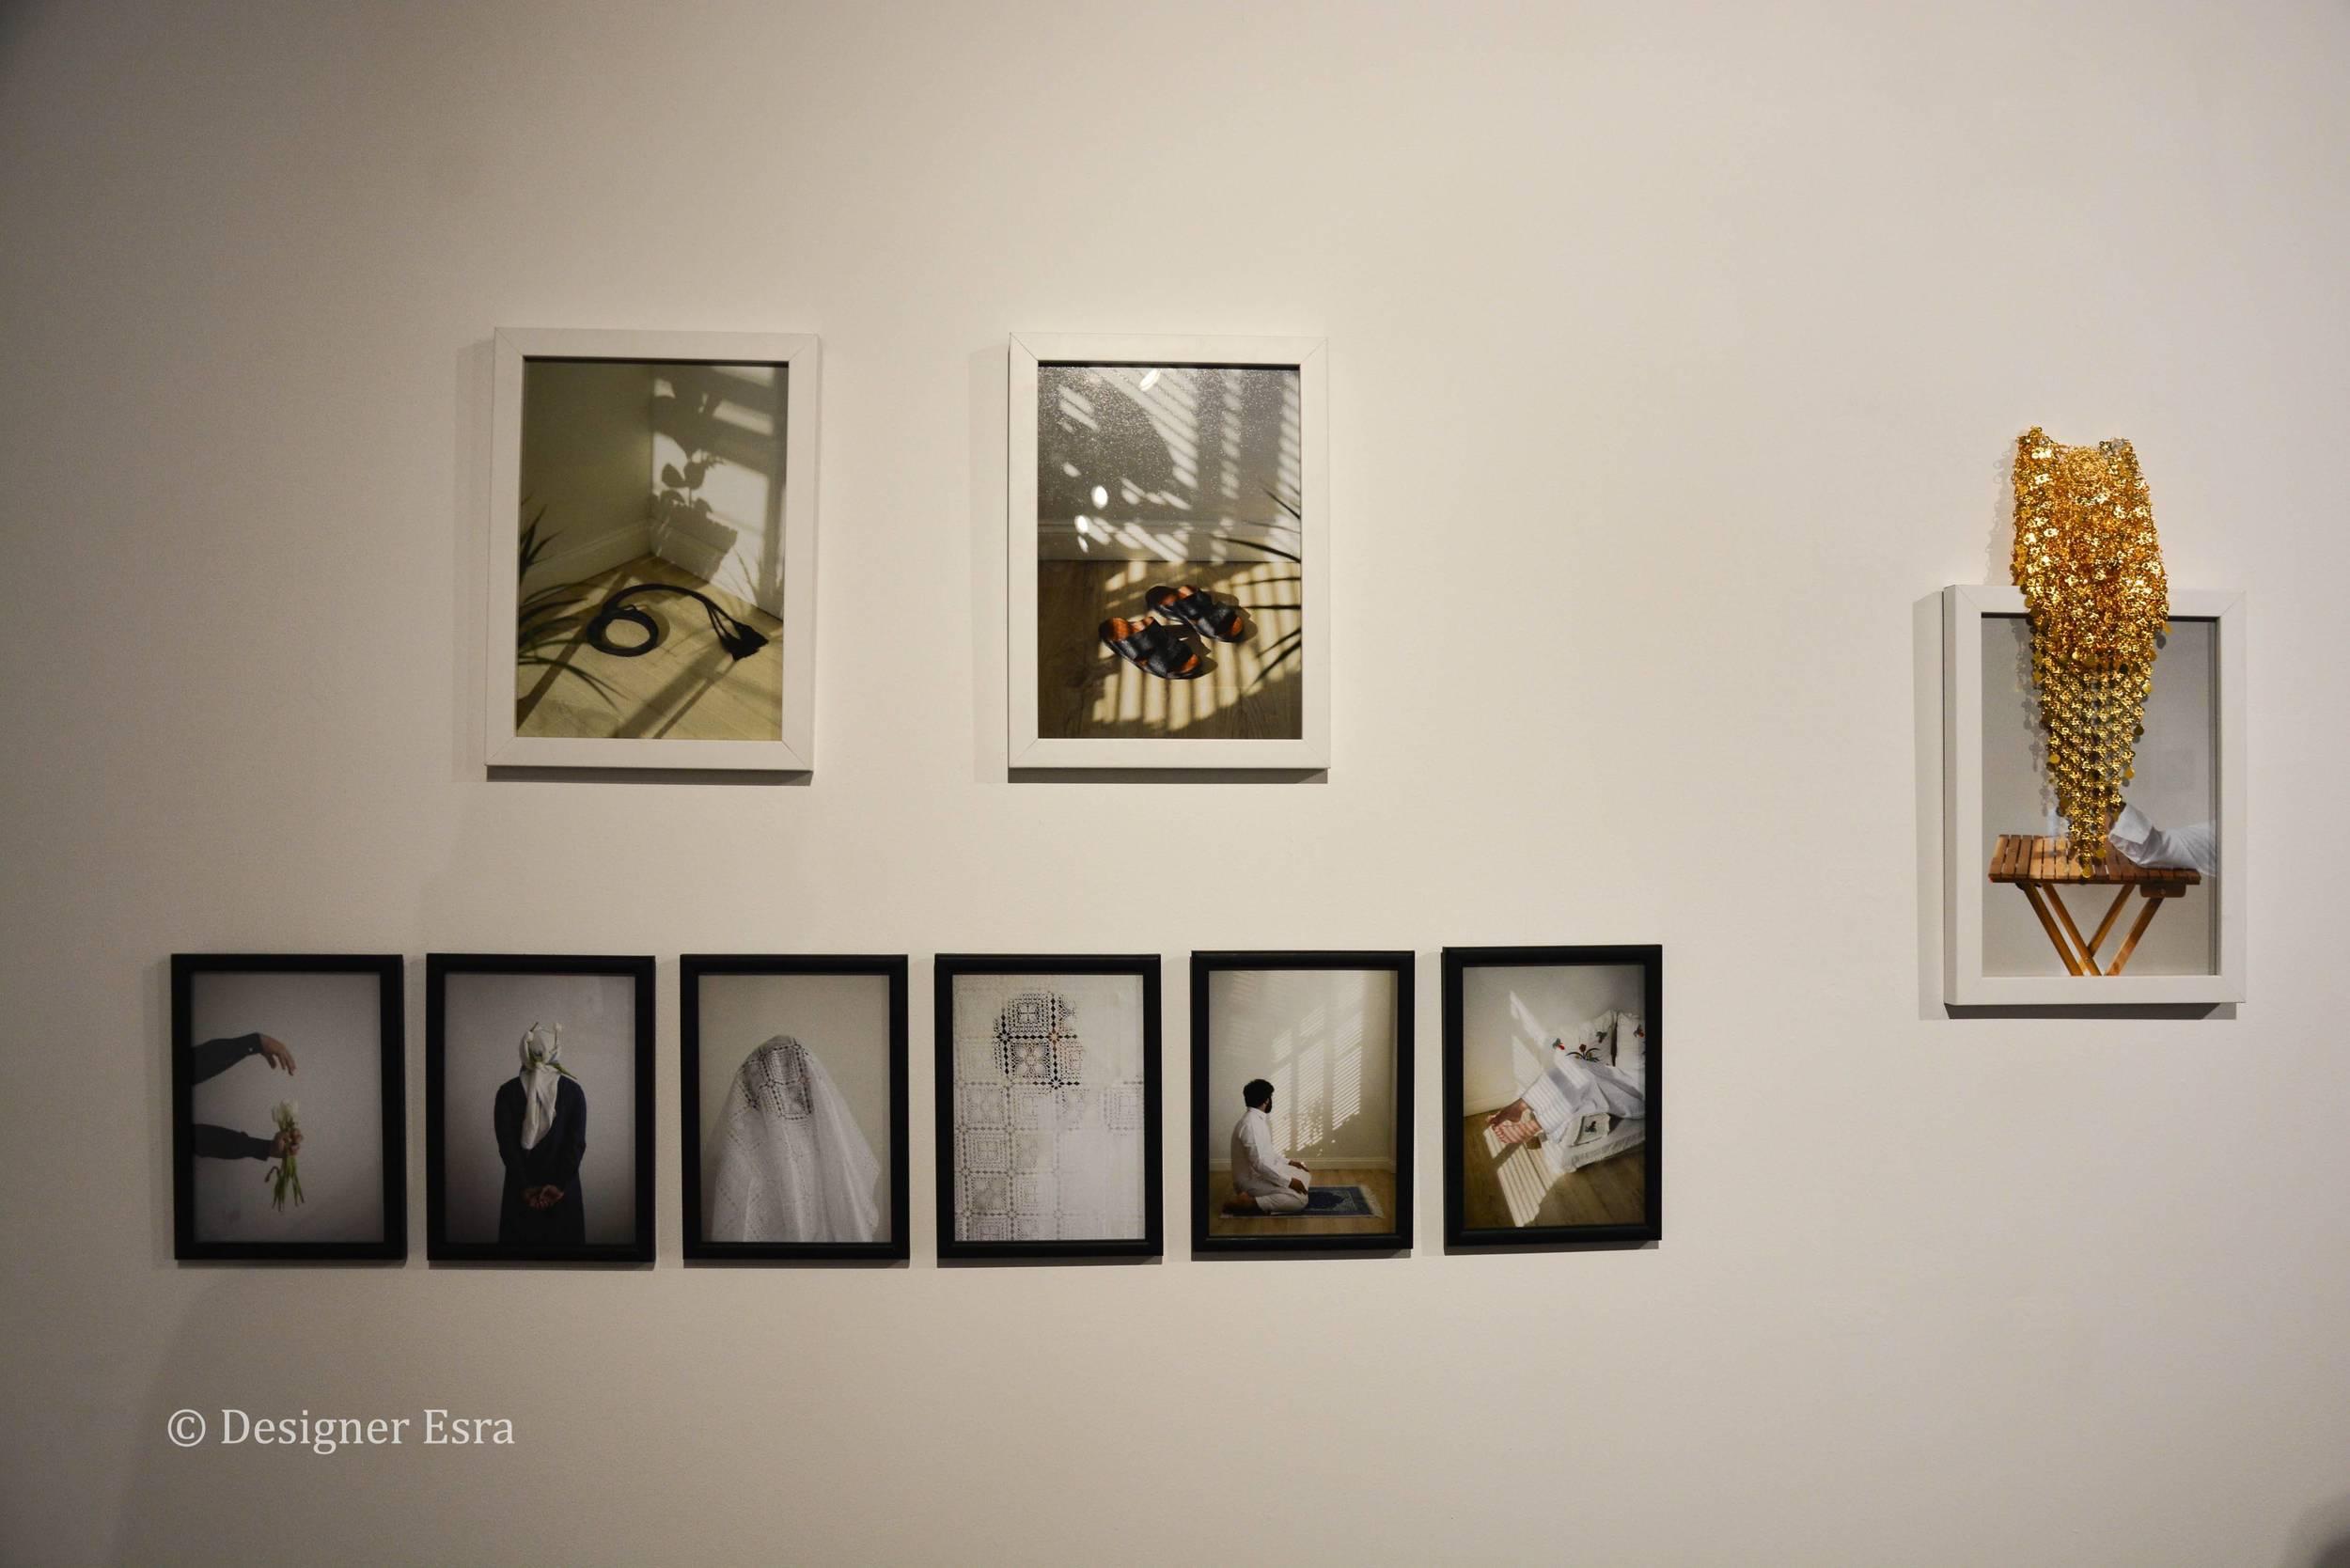 Photos by Sara Foryame aka Frozenvanity